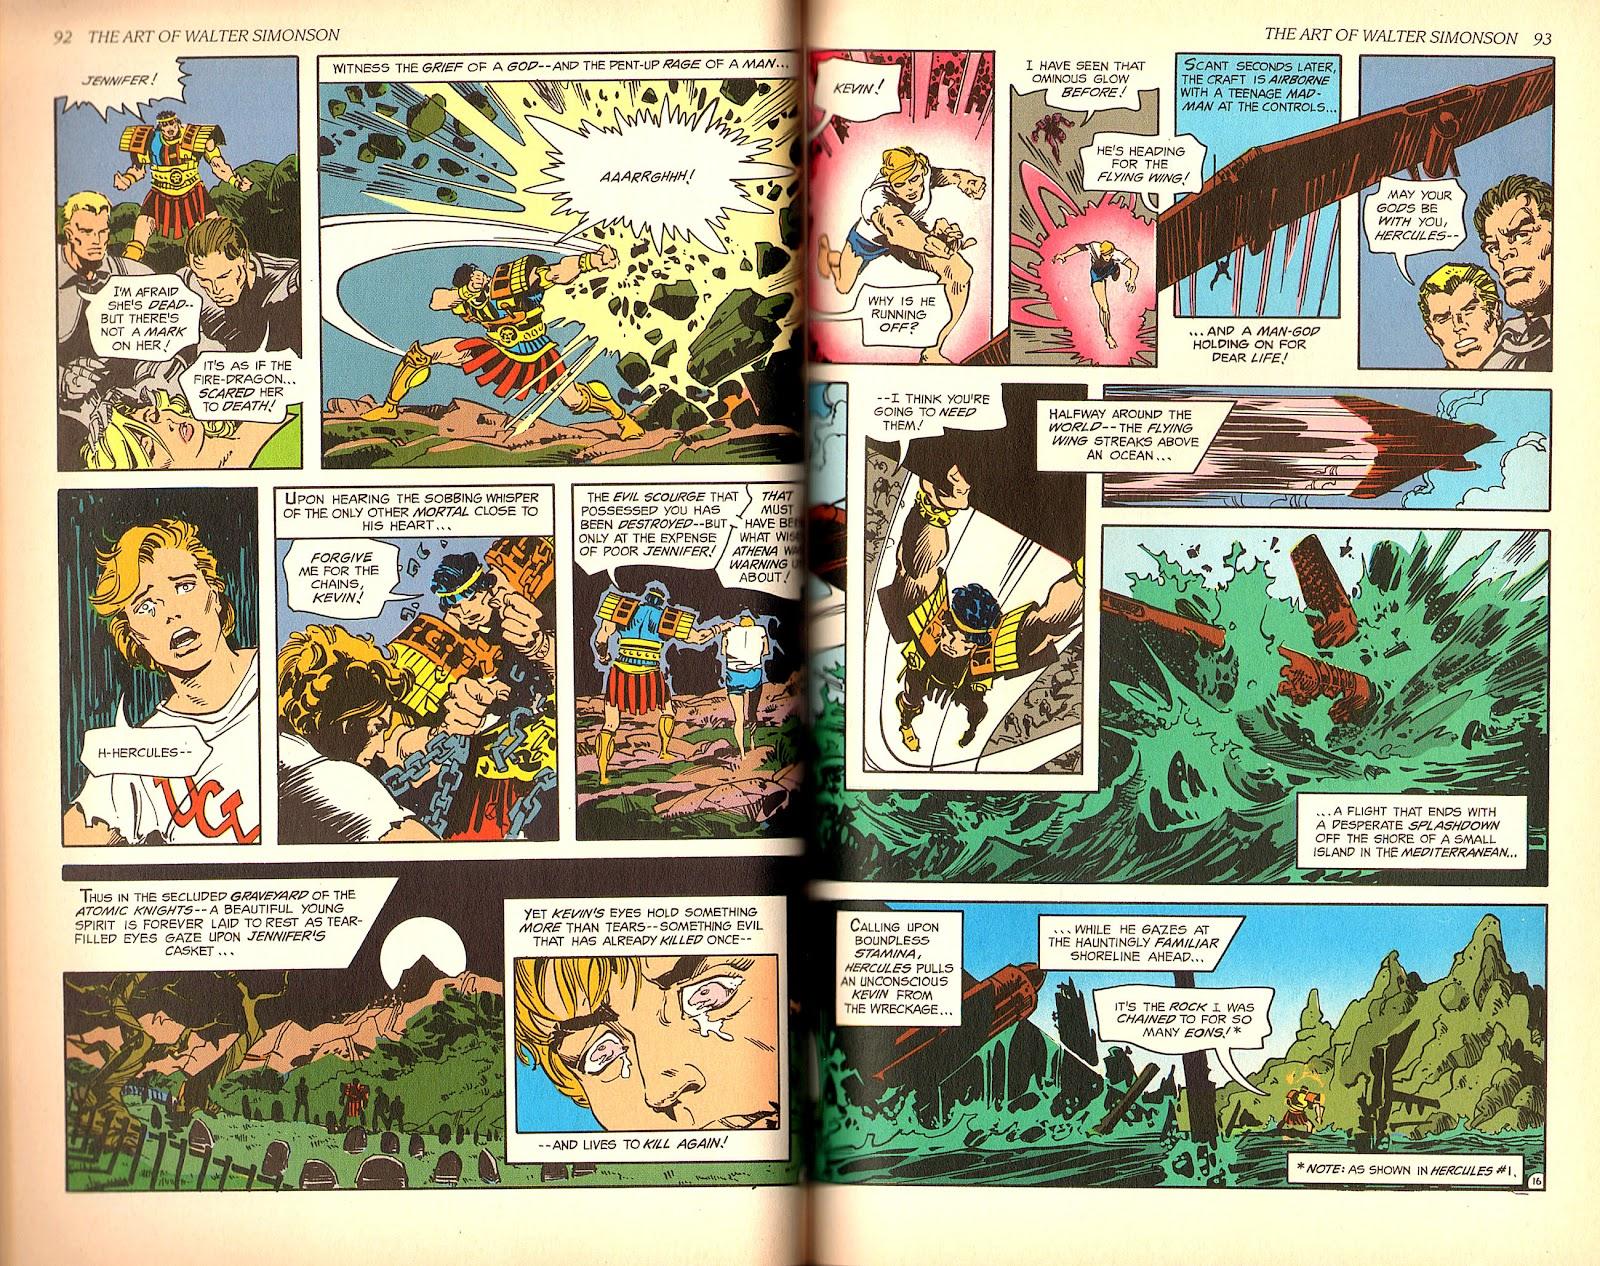 Read online The Art of Walter Simonson comic -  Issue # TPB - 48